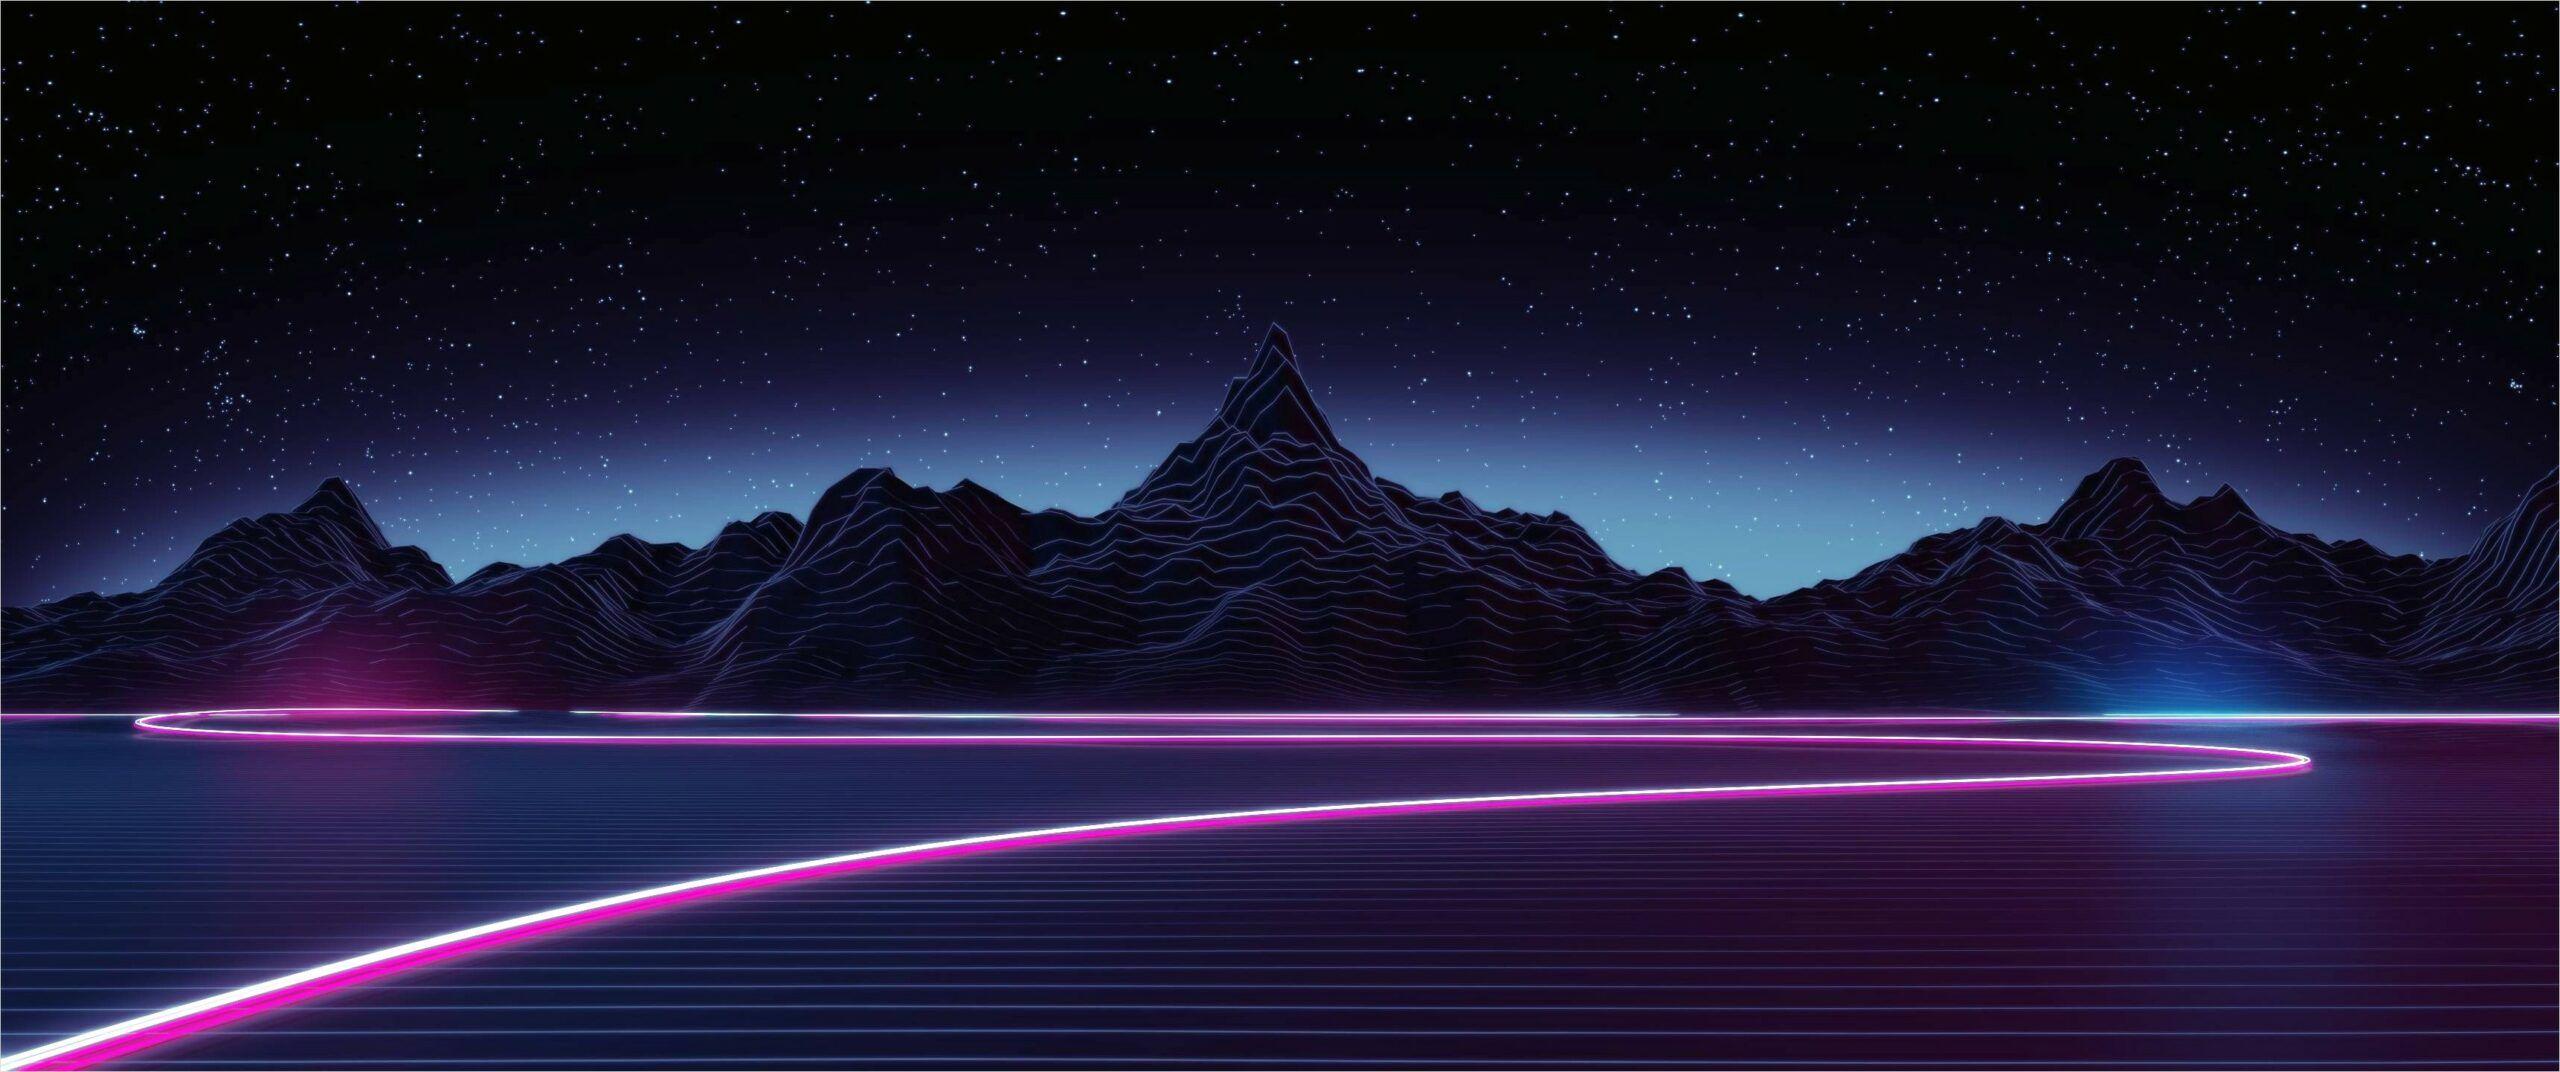 4k Aesthetic Neon Wallpaper In 2020 Mountain Wallpaper Hd Wallpaper Aesthetic Wallpapers